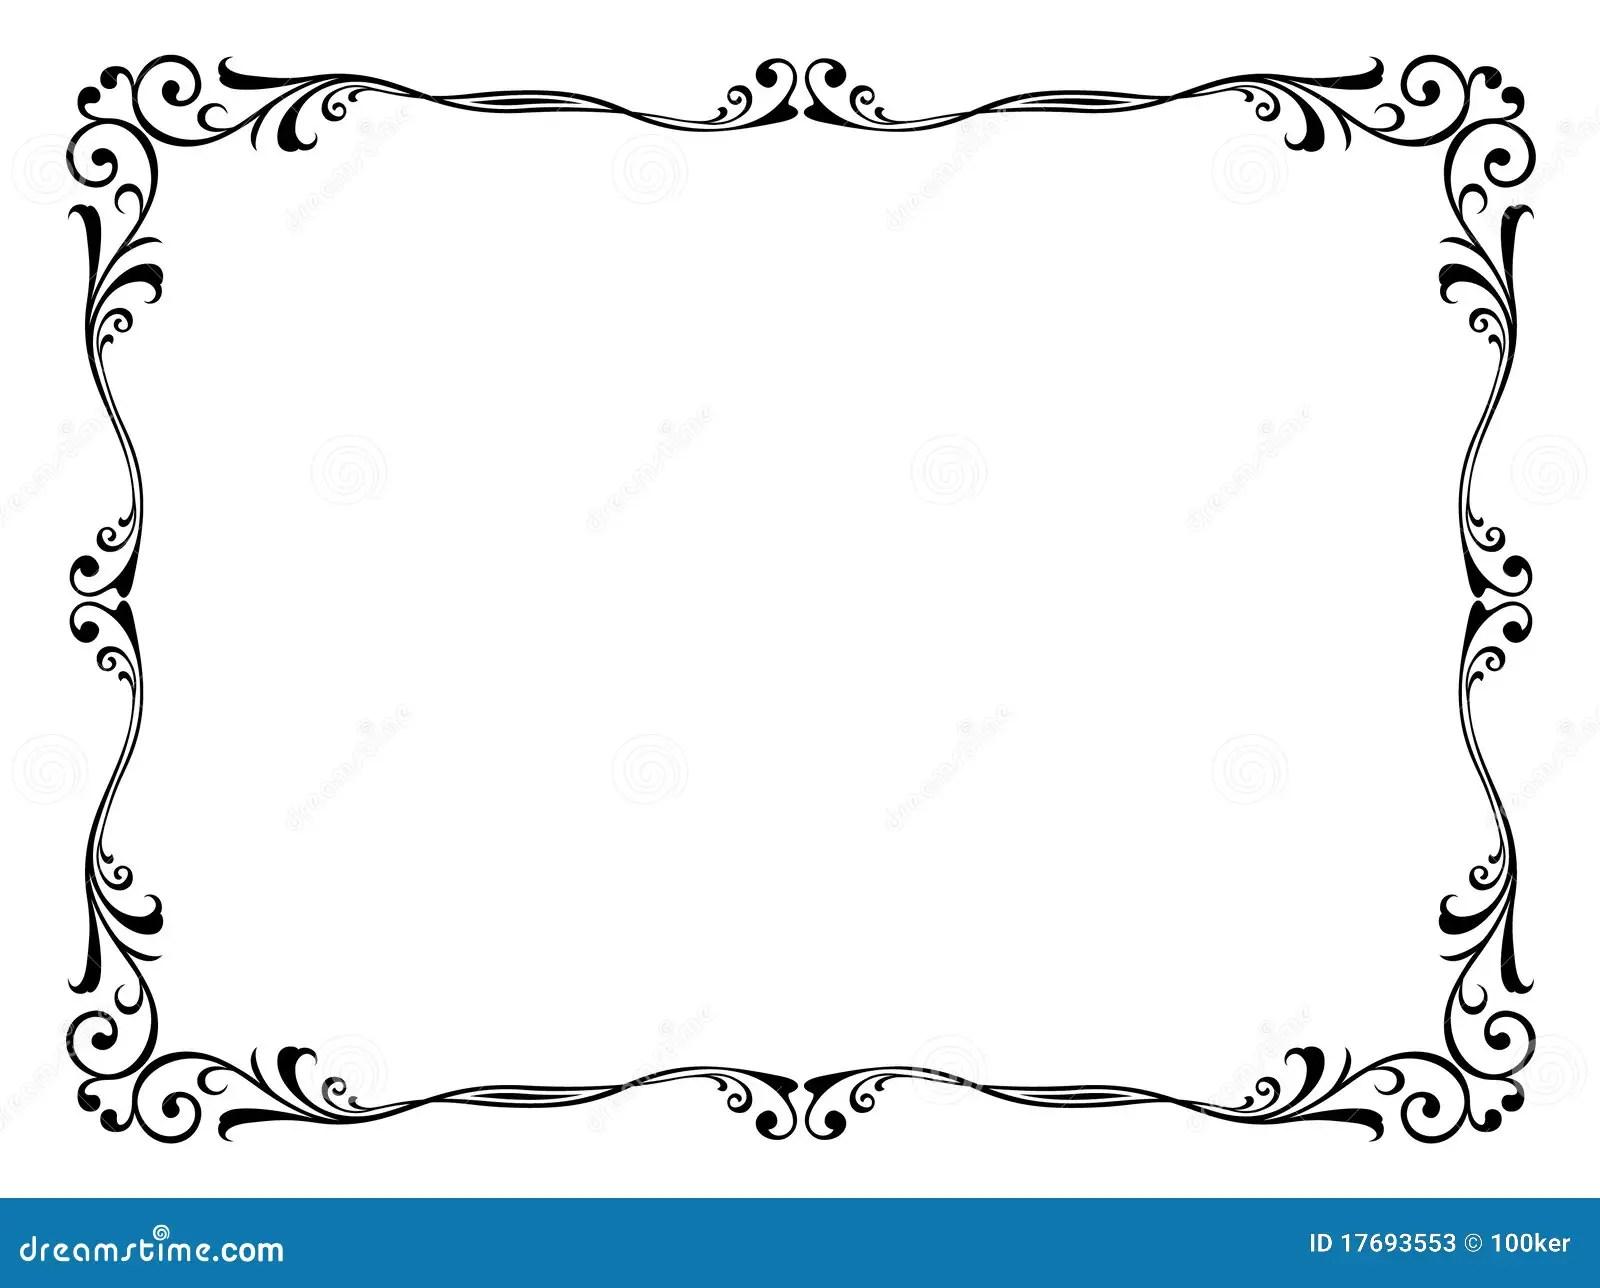 Floral Ornamental Decorative Frame Stock Vector